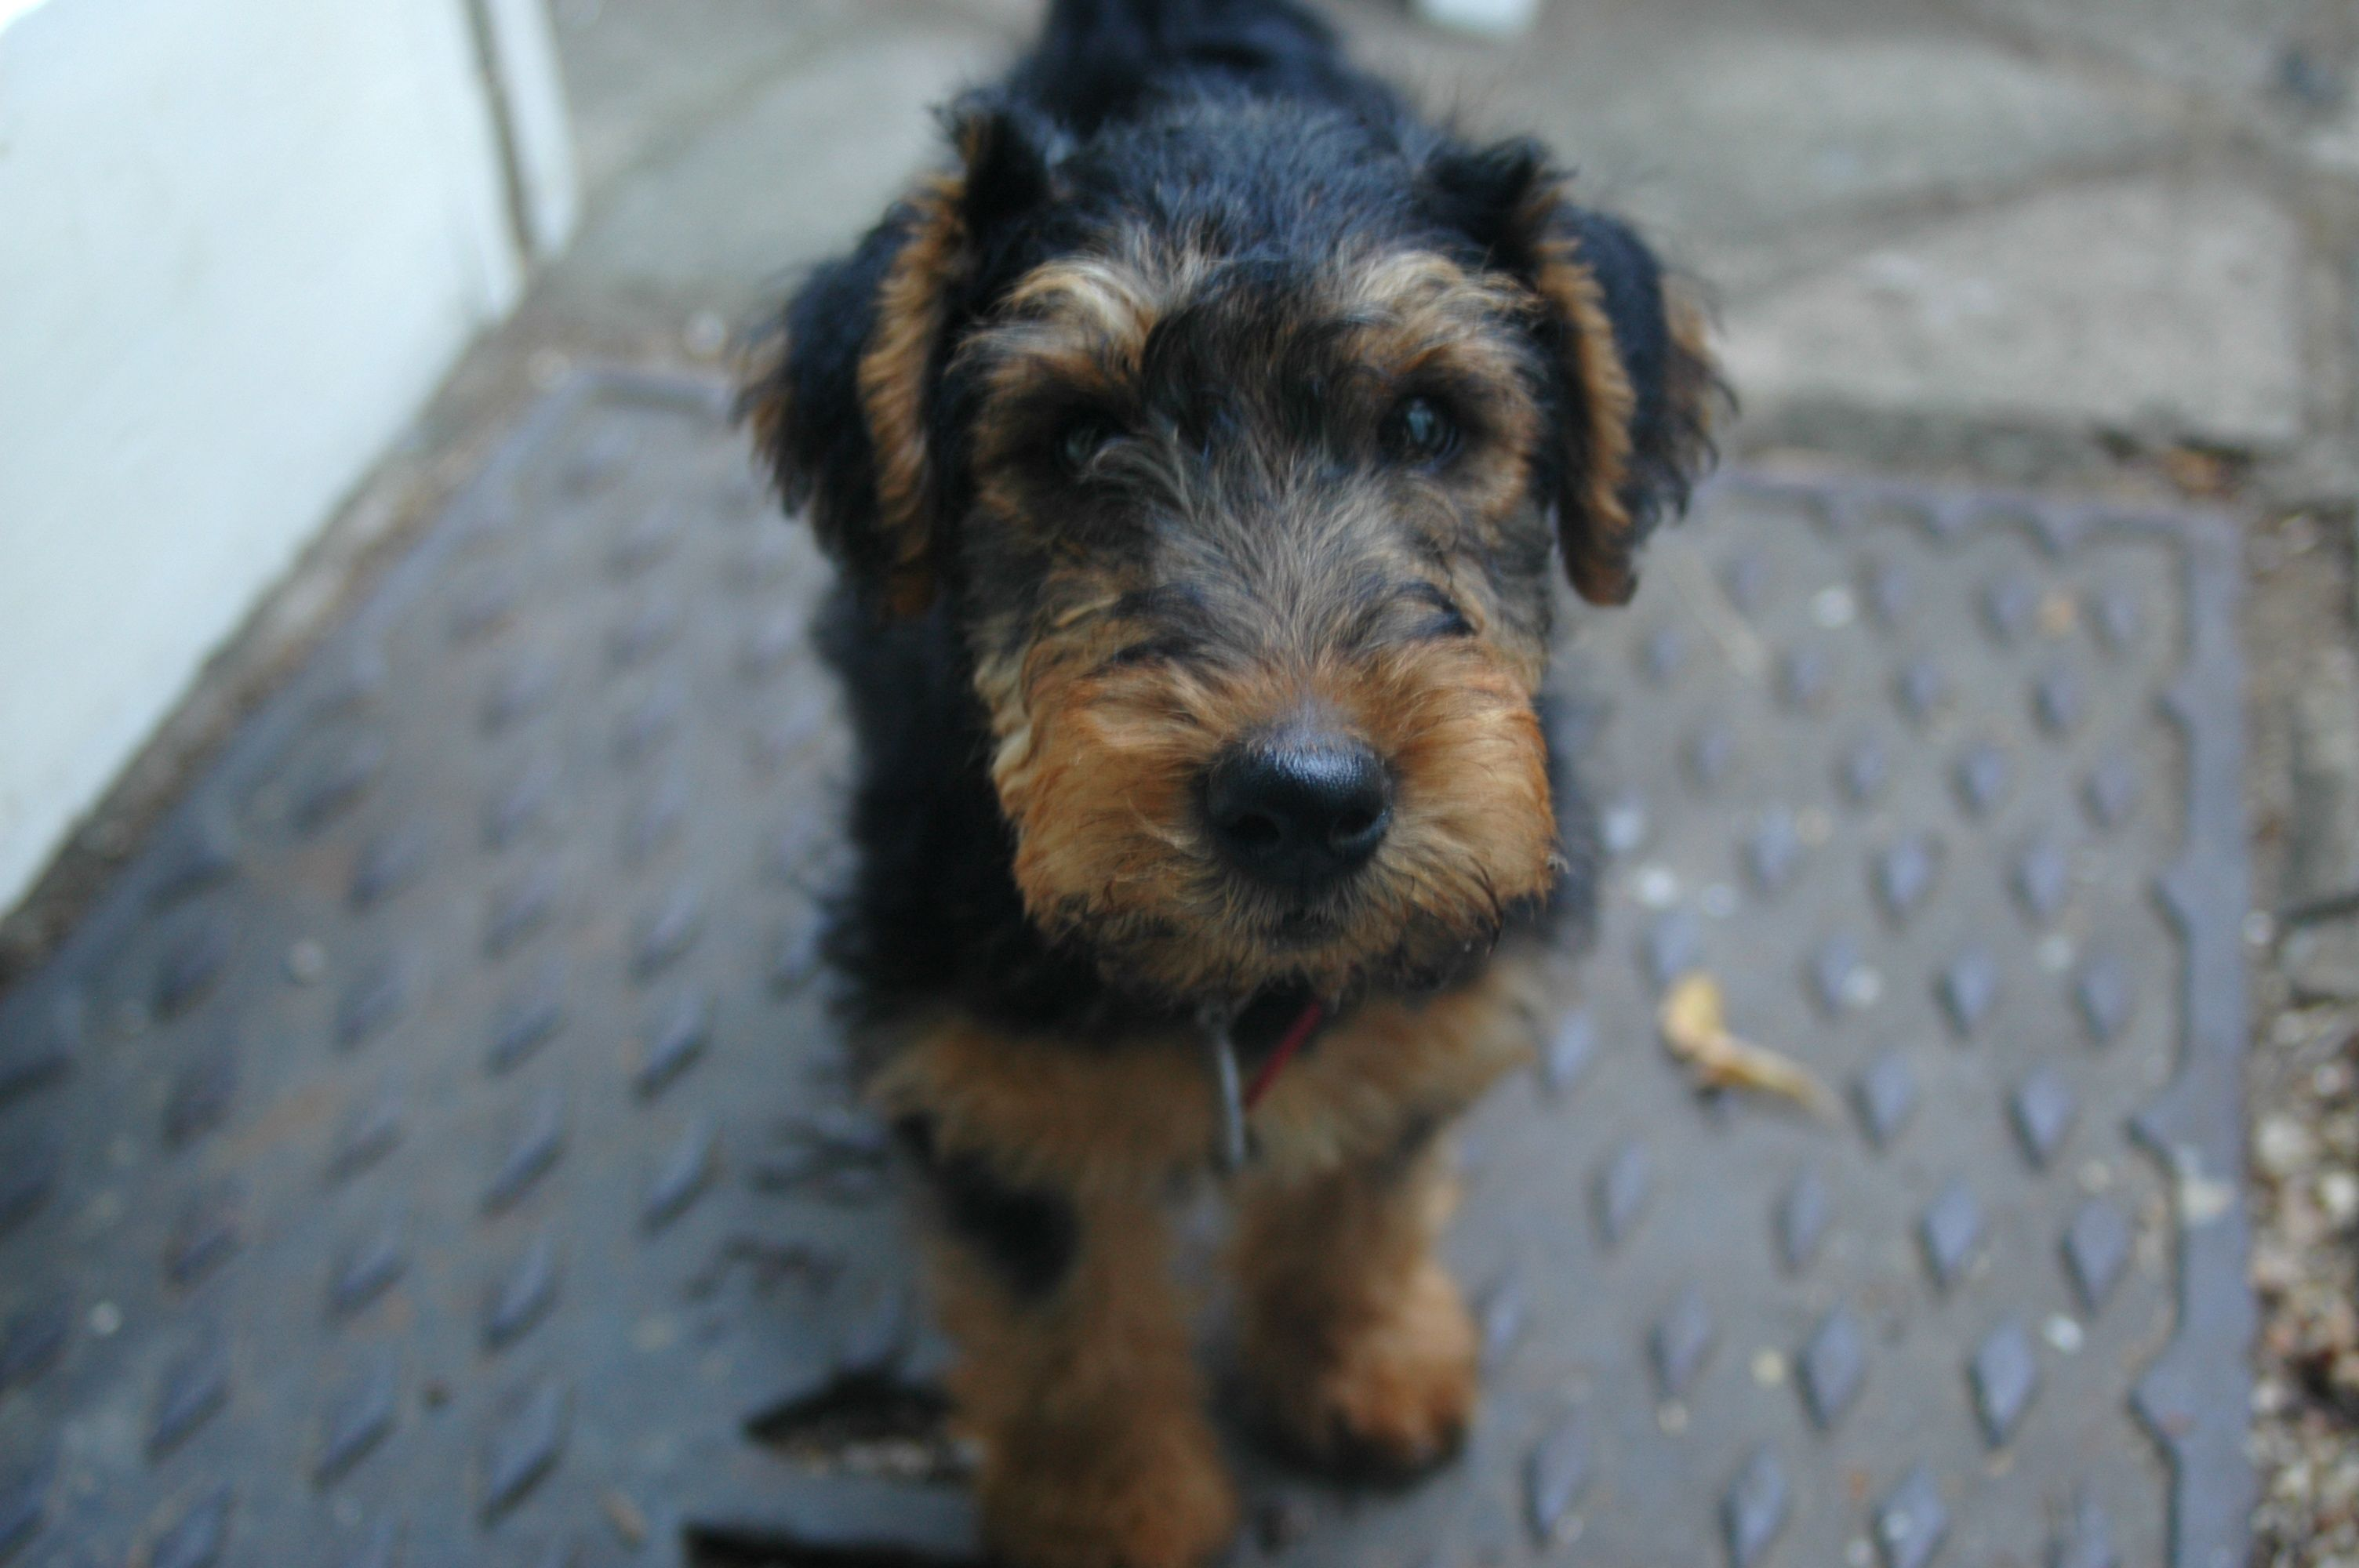 Atticus Welsh terrier at 2 months